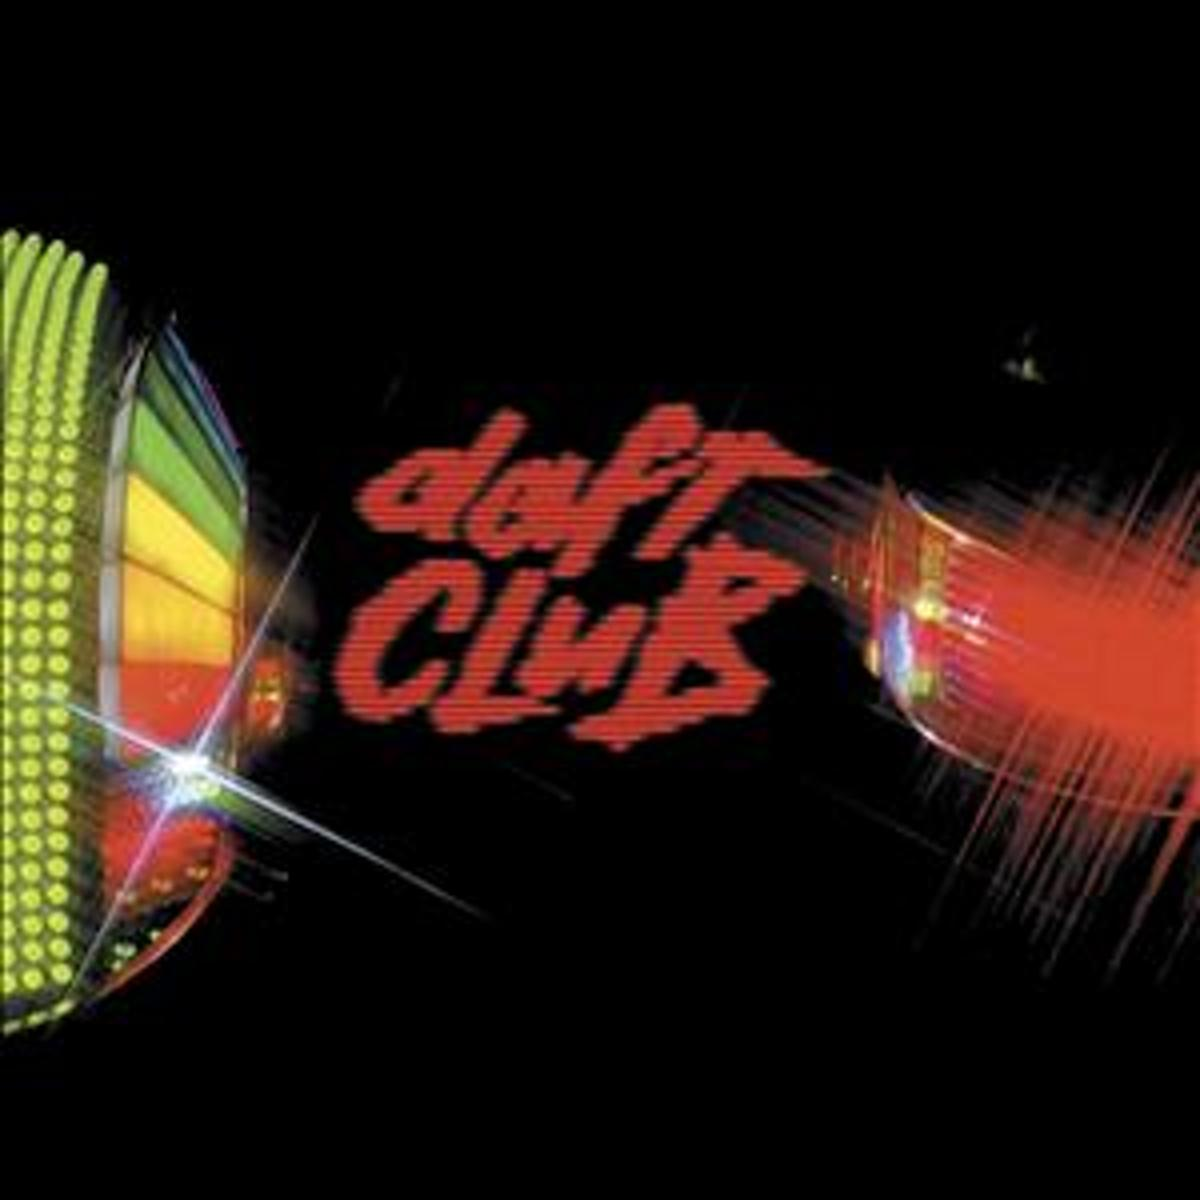 Daft Club kopen